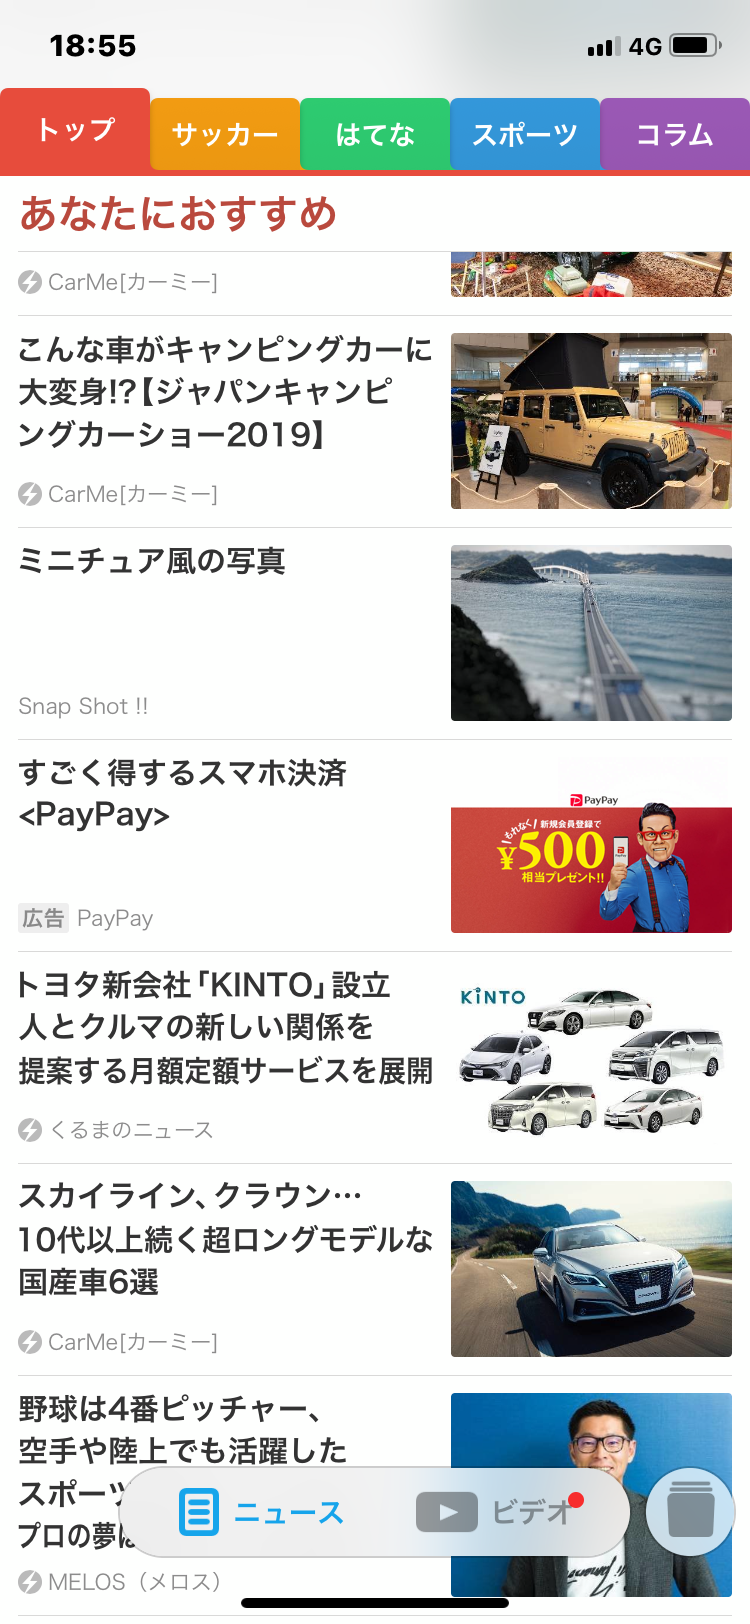 f:id:yuuki89:20190207203452p:image